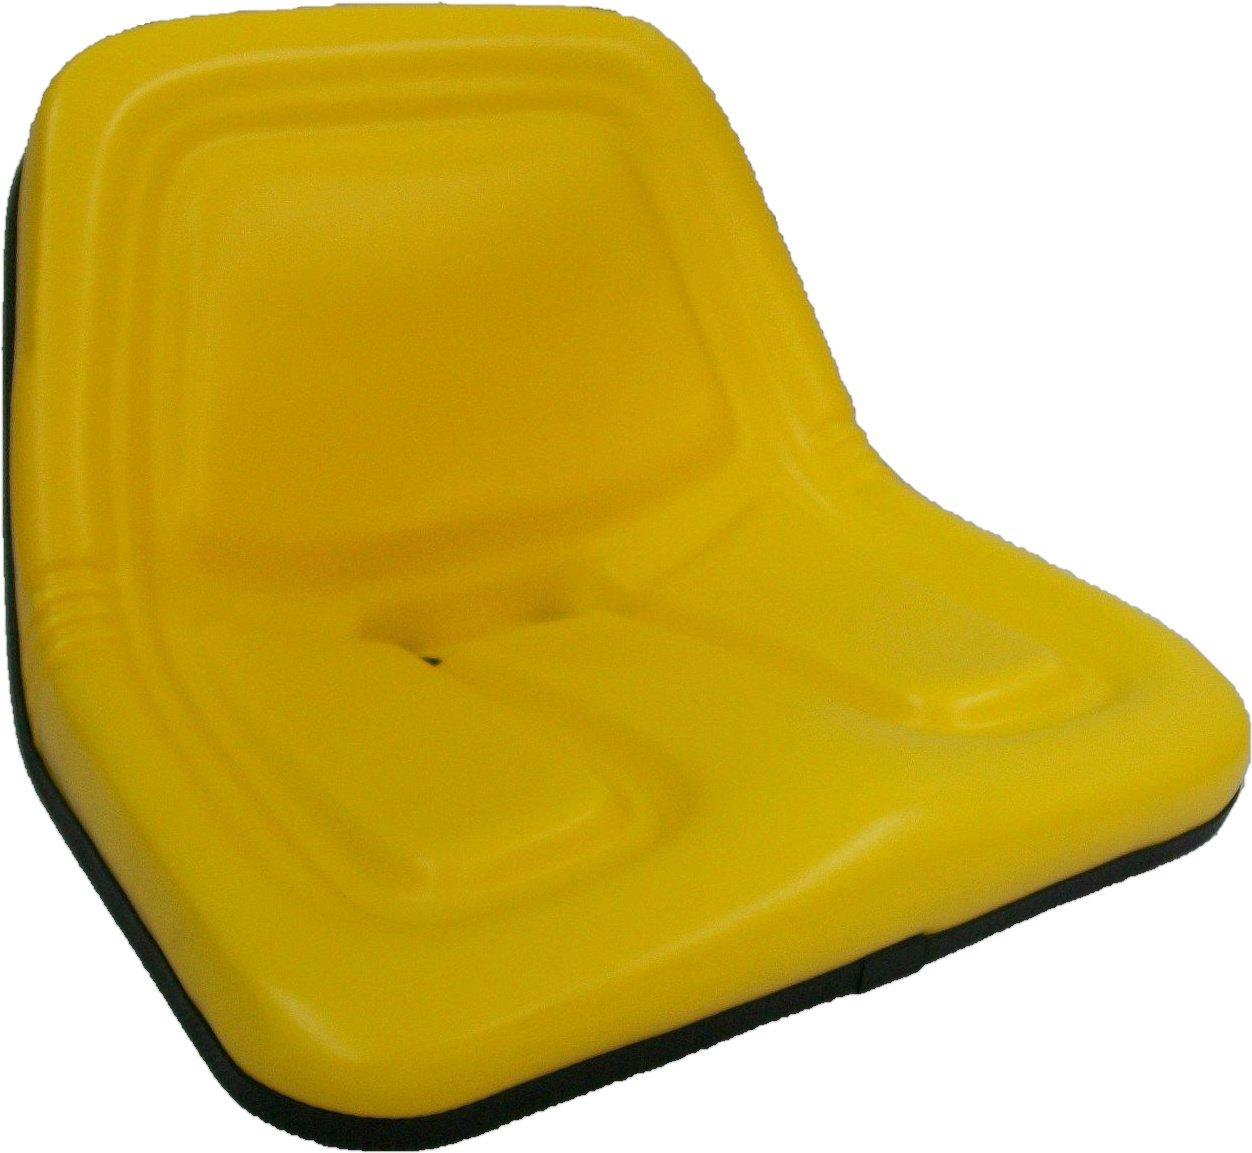 REPLACEMENT SEAT for JOHN DEERE 120, 130, 140, 160, 165, 214, 300, 312,  314, 316, 317, 318, 400 STX38 MOWERS STEEL PAN FRAME #BZ